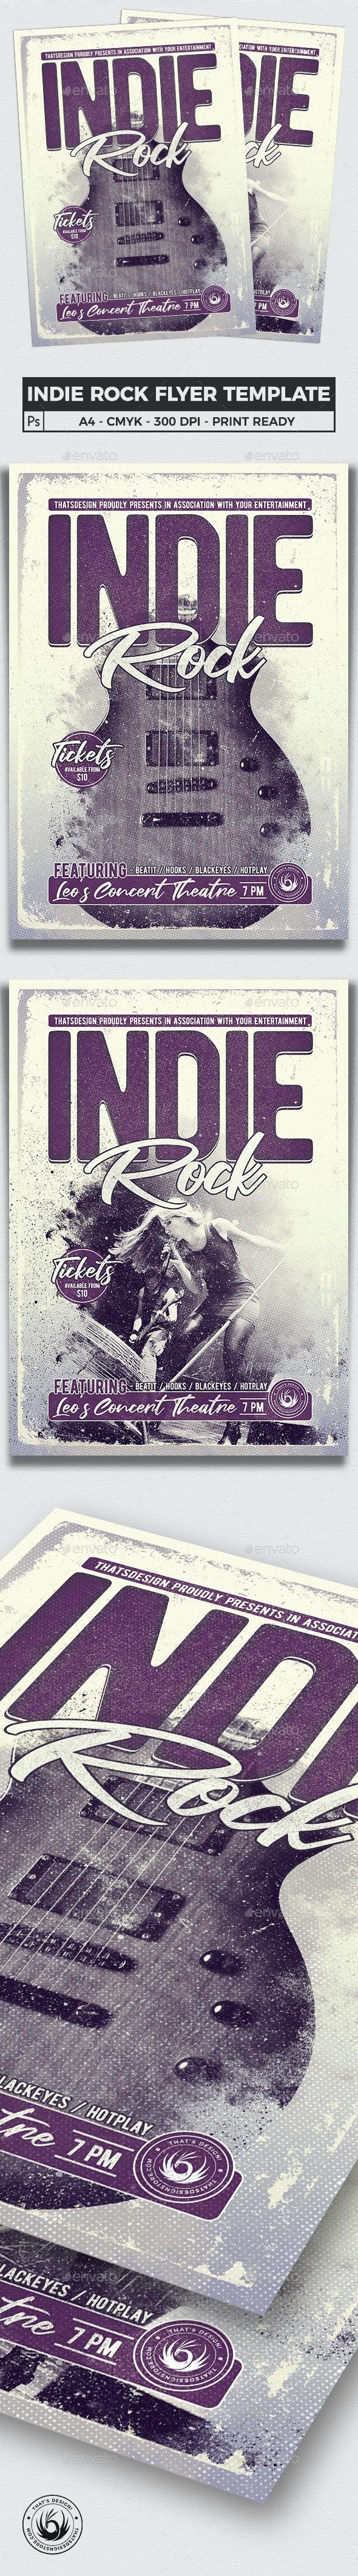 Indie Rock Flyer Template V3 - Concerts Events